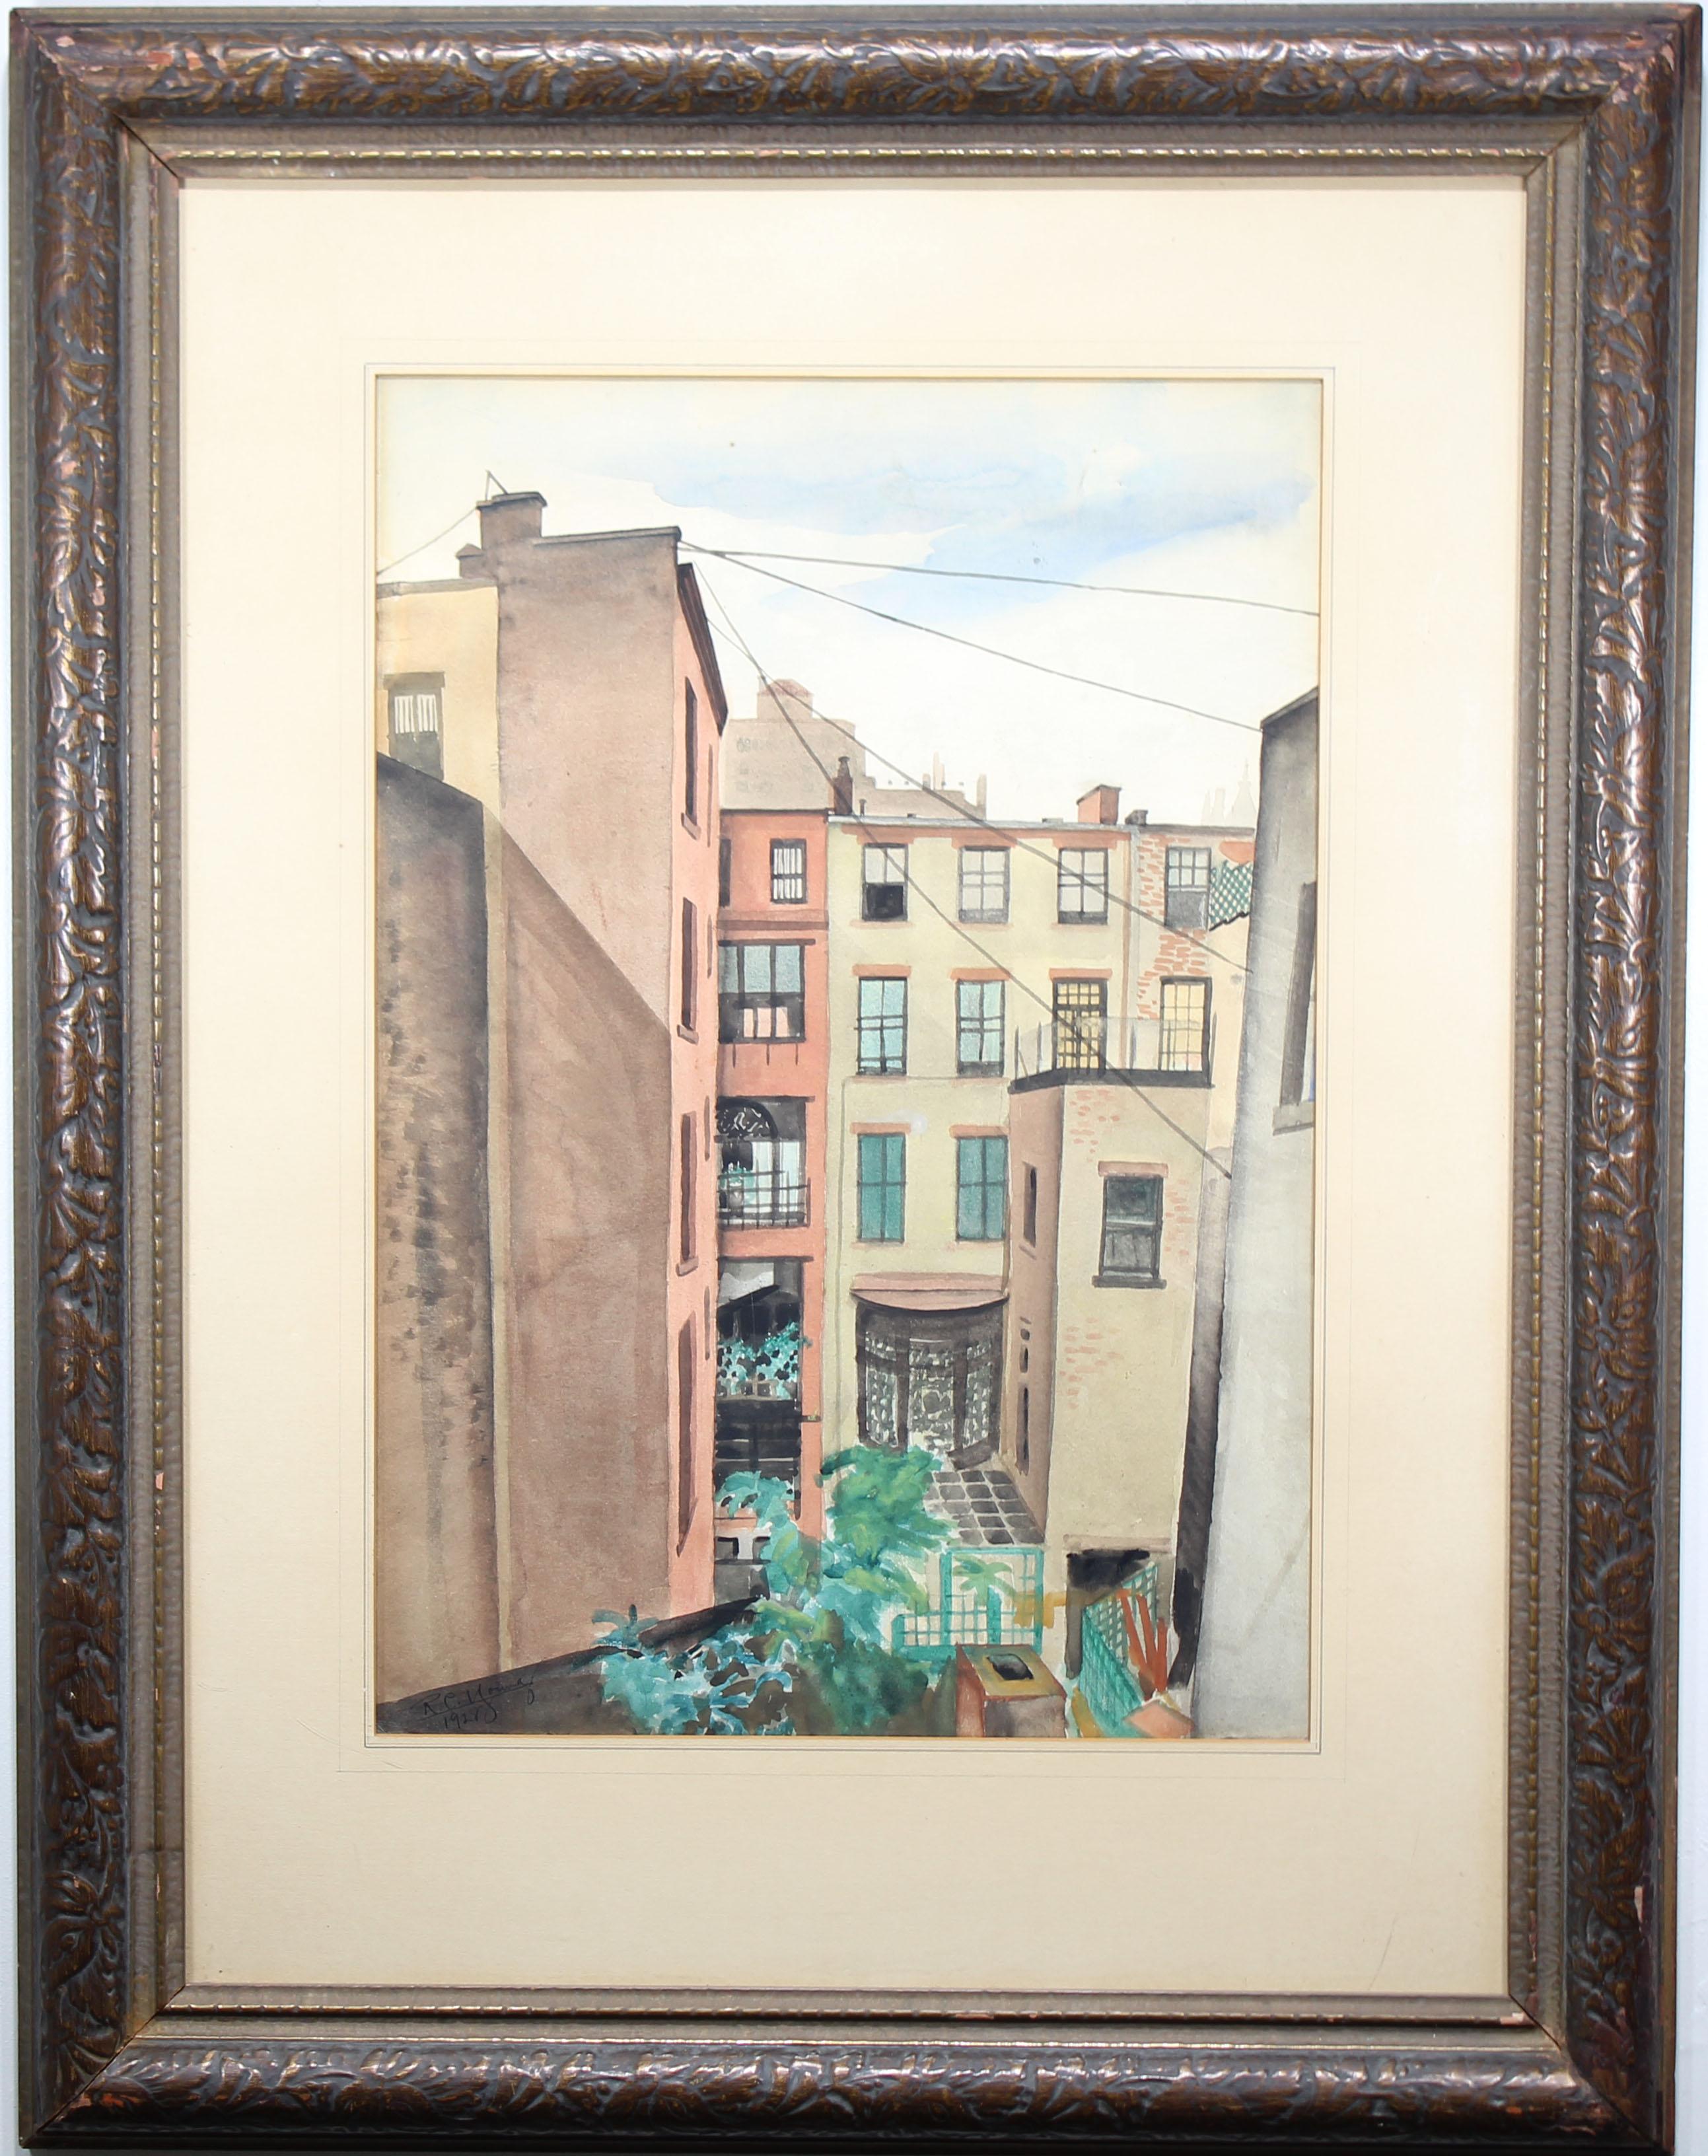 Lot 219 - Richard Young (mid-20th C.) New York City